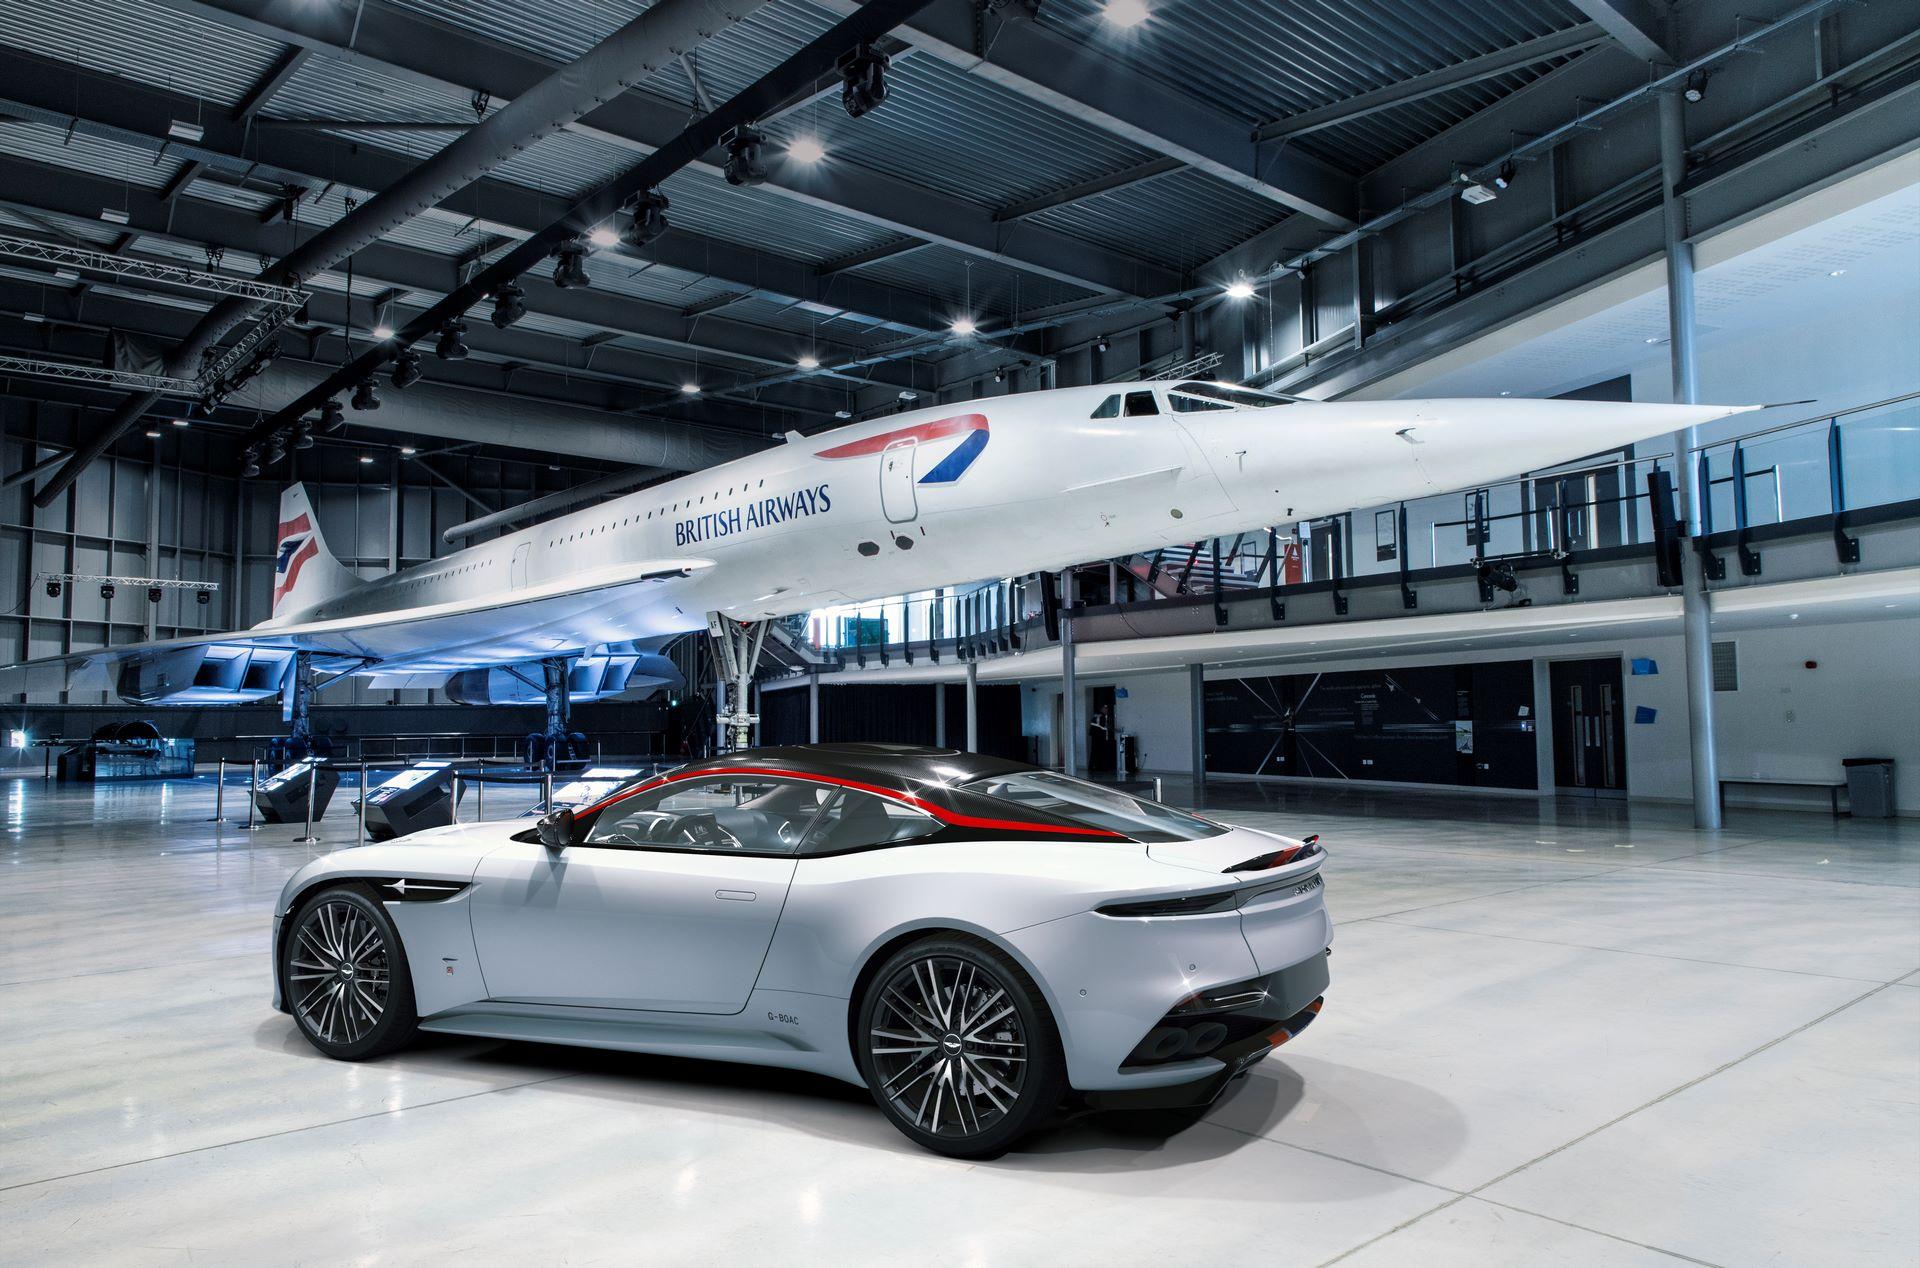 Aston-Martin-DBS-Superleggera-Concorde-Edition_02